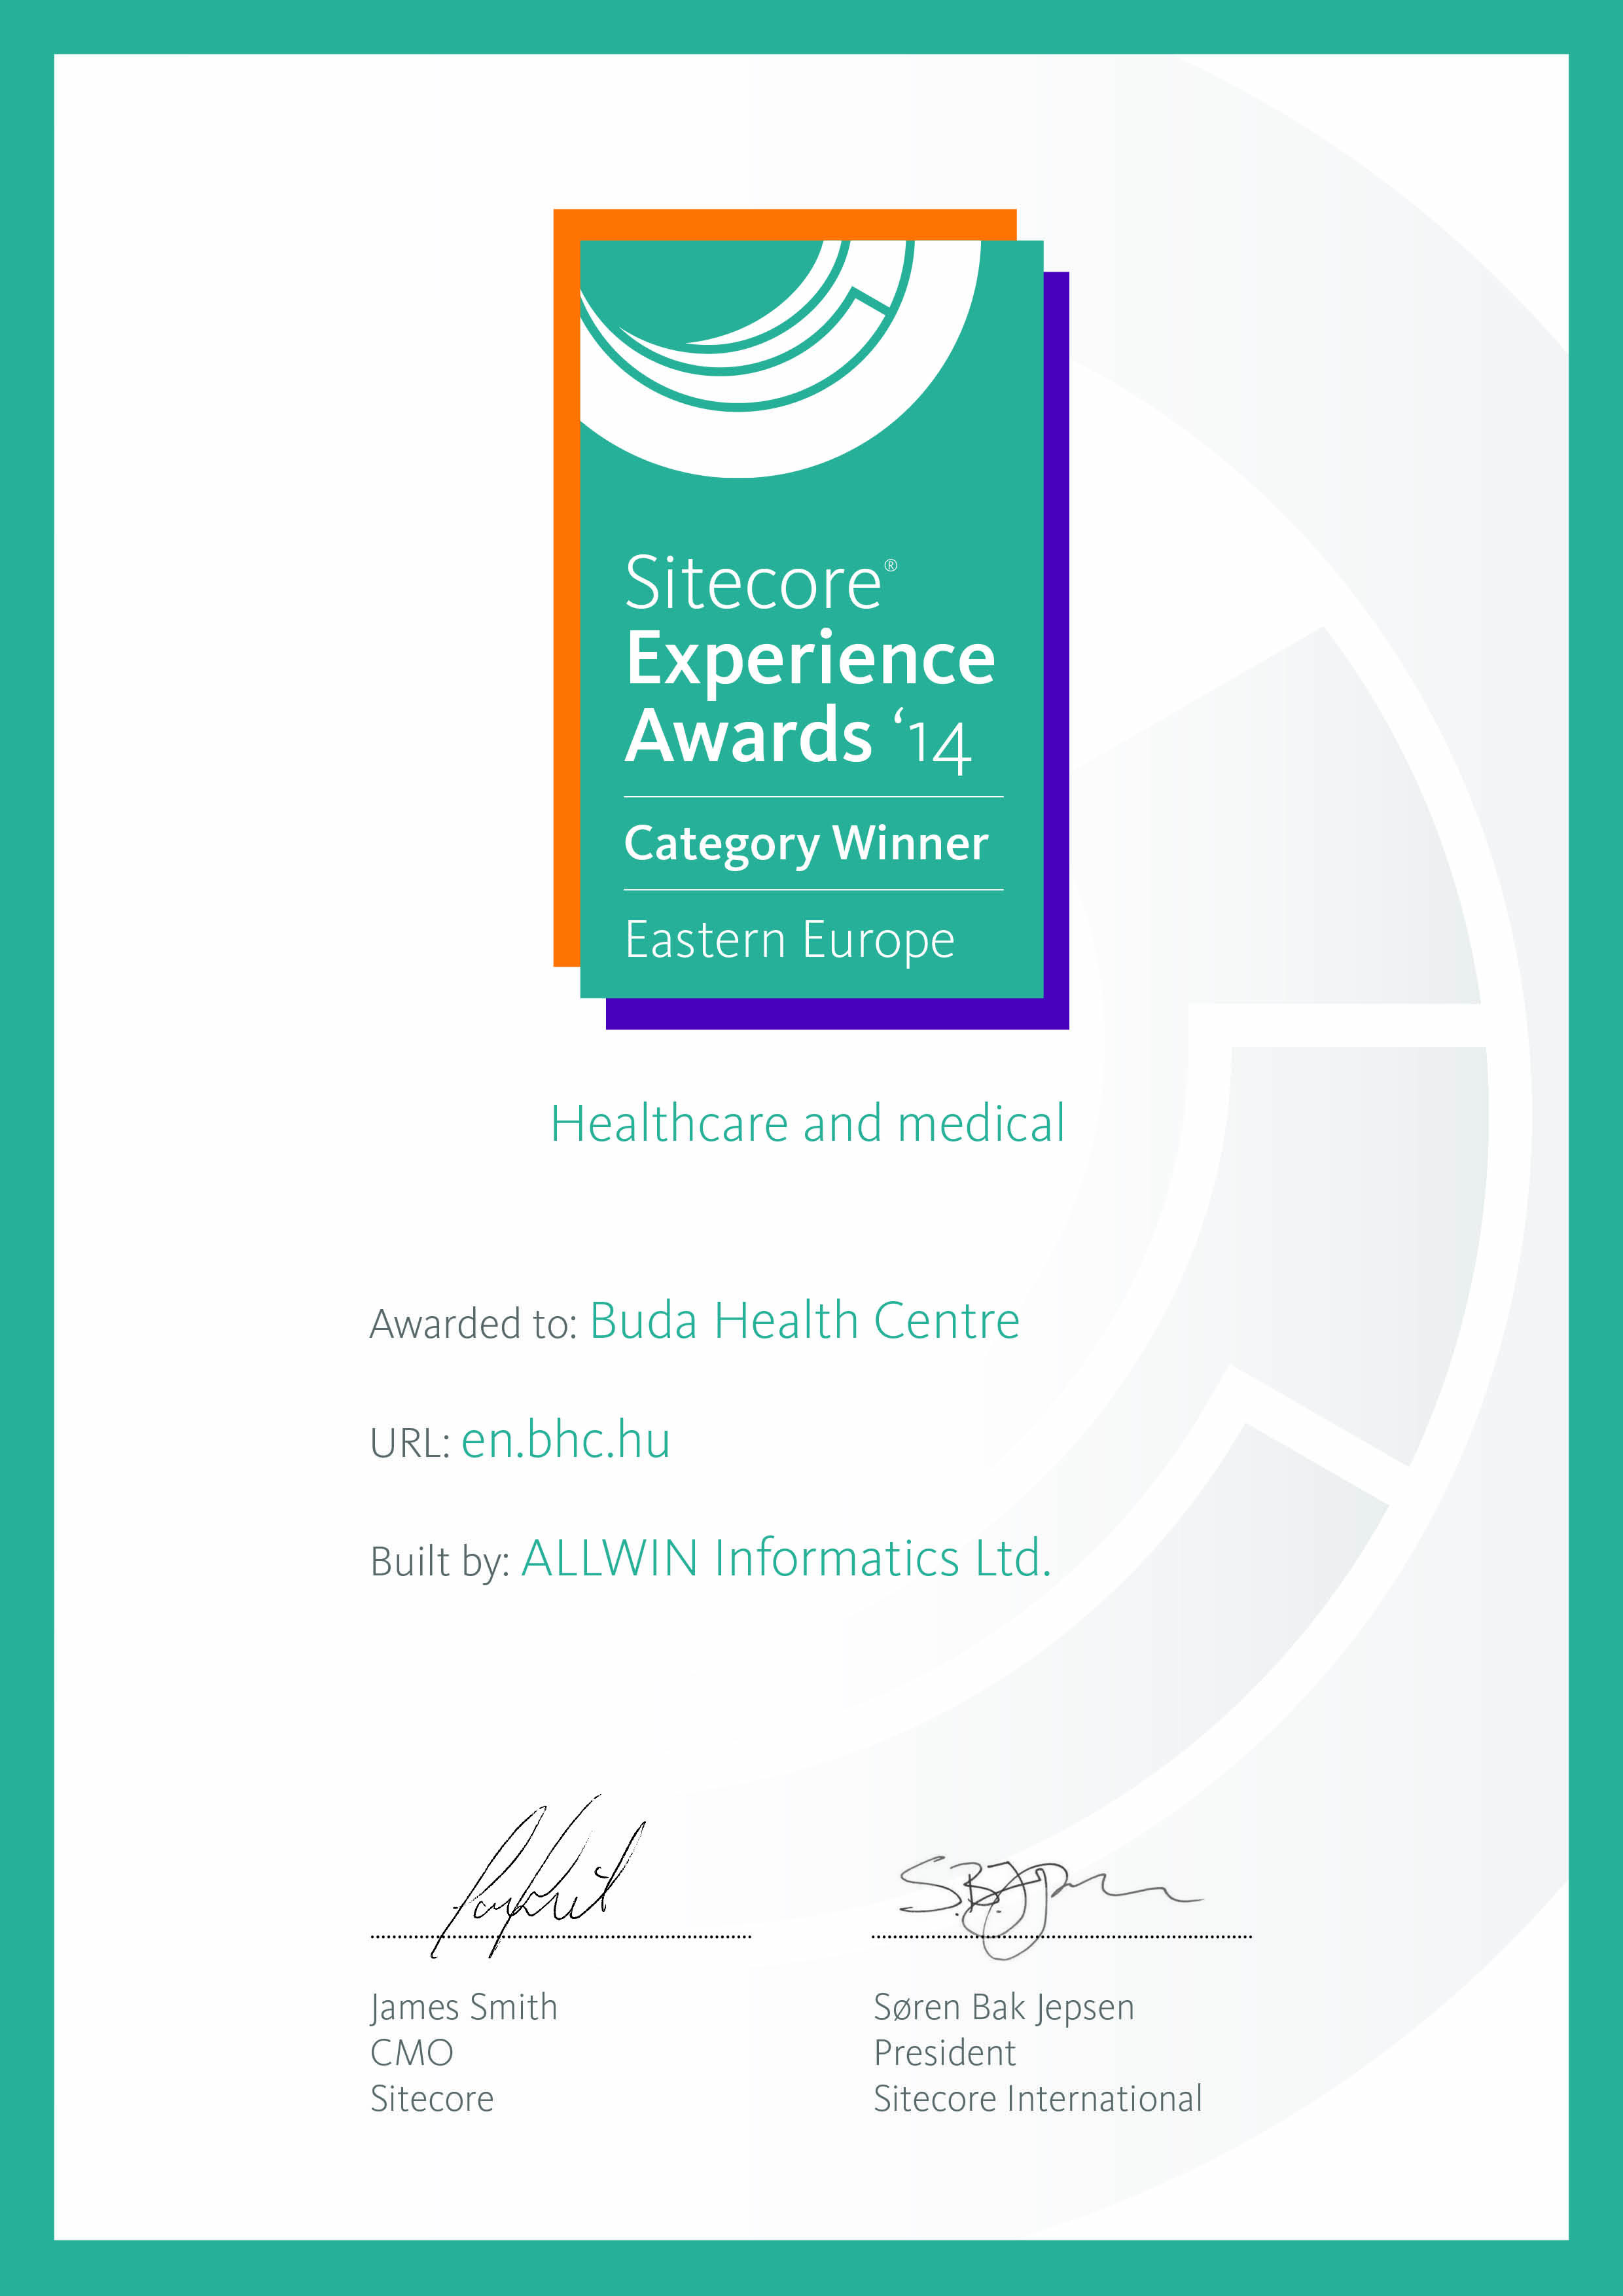 Sitecore-European-Award-Certificate-2014